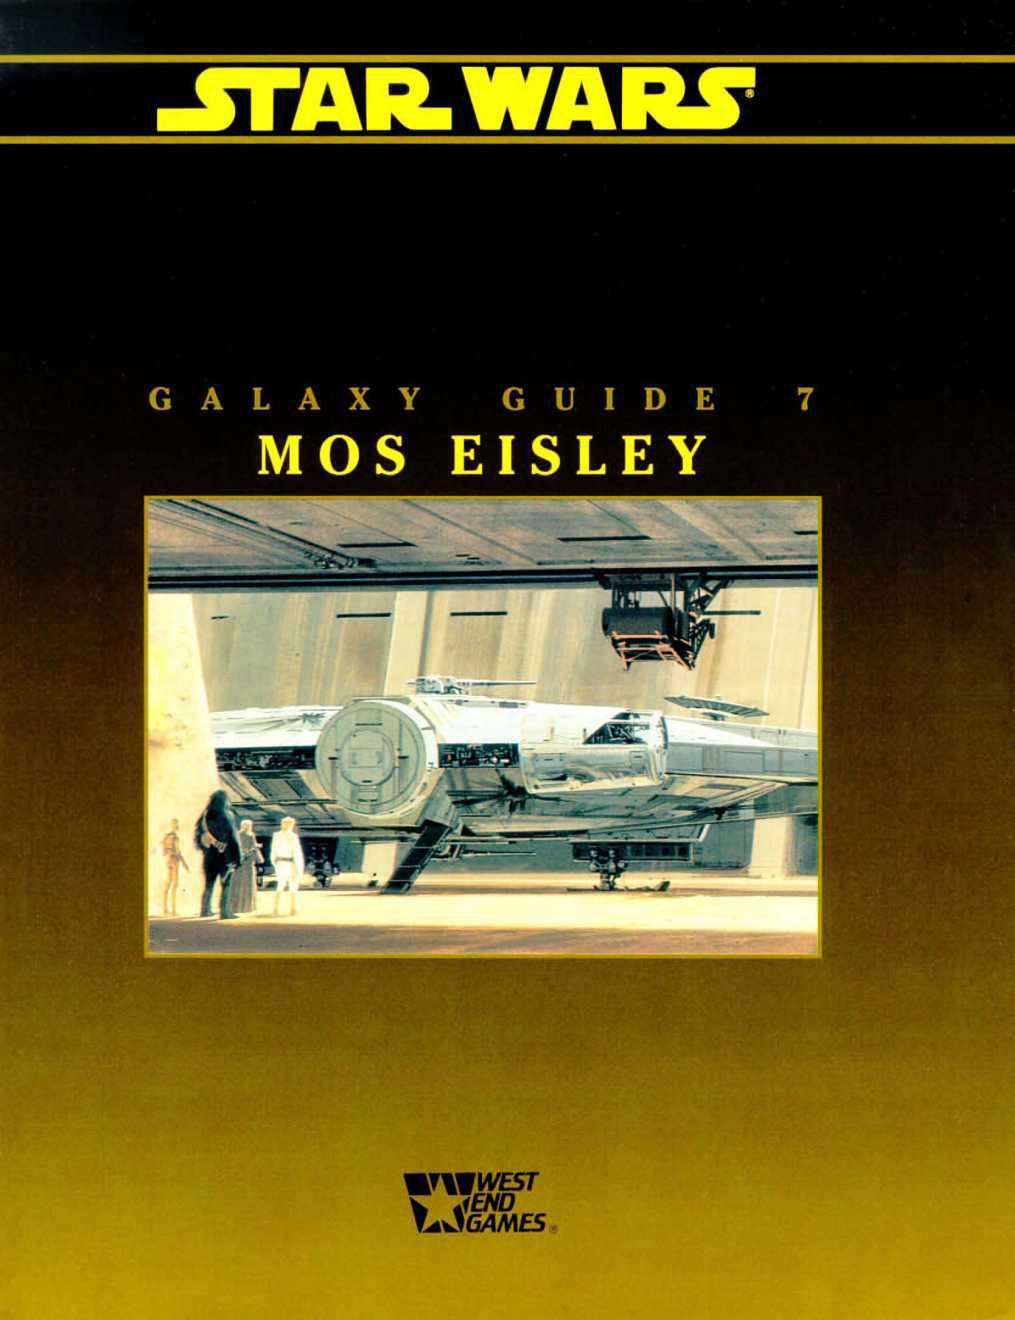 Star Wars Galaxy Guide 7: Mos Eisely